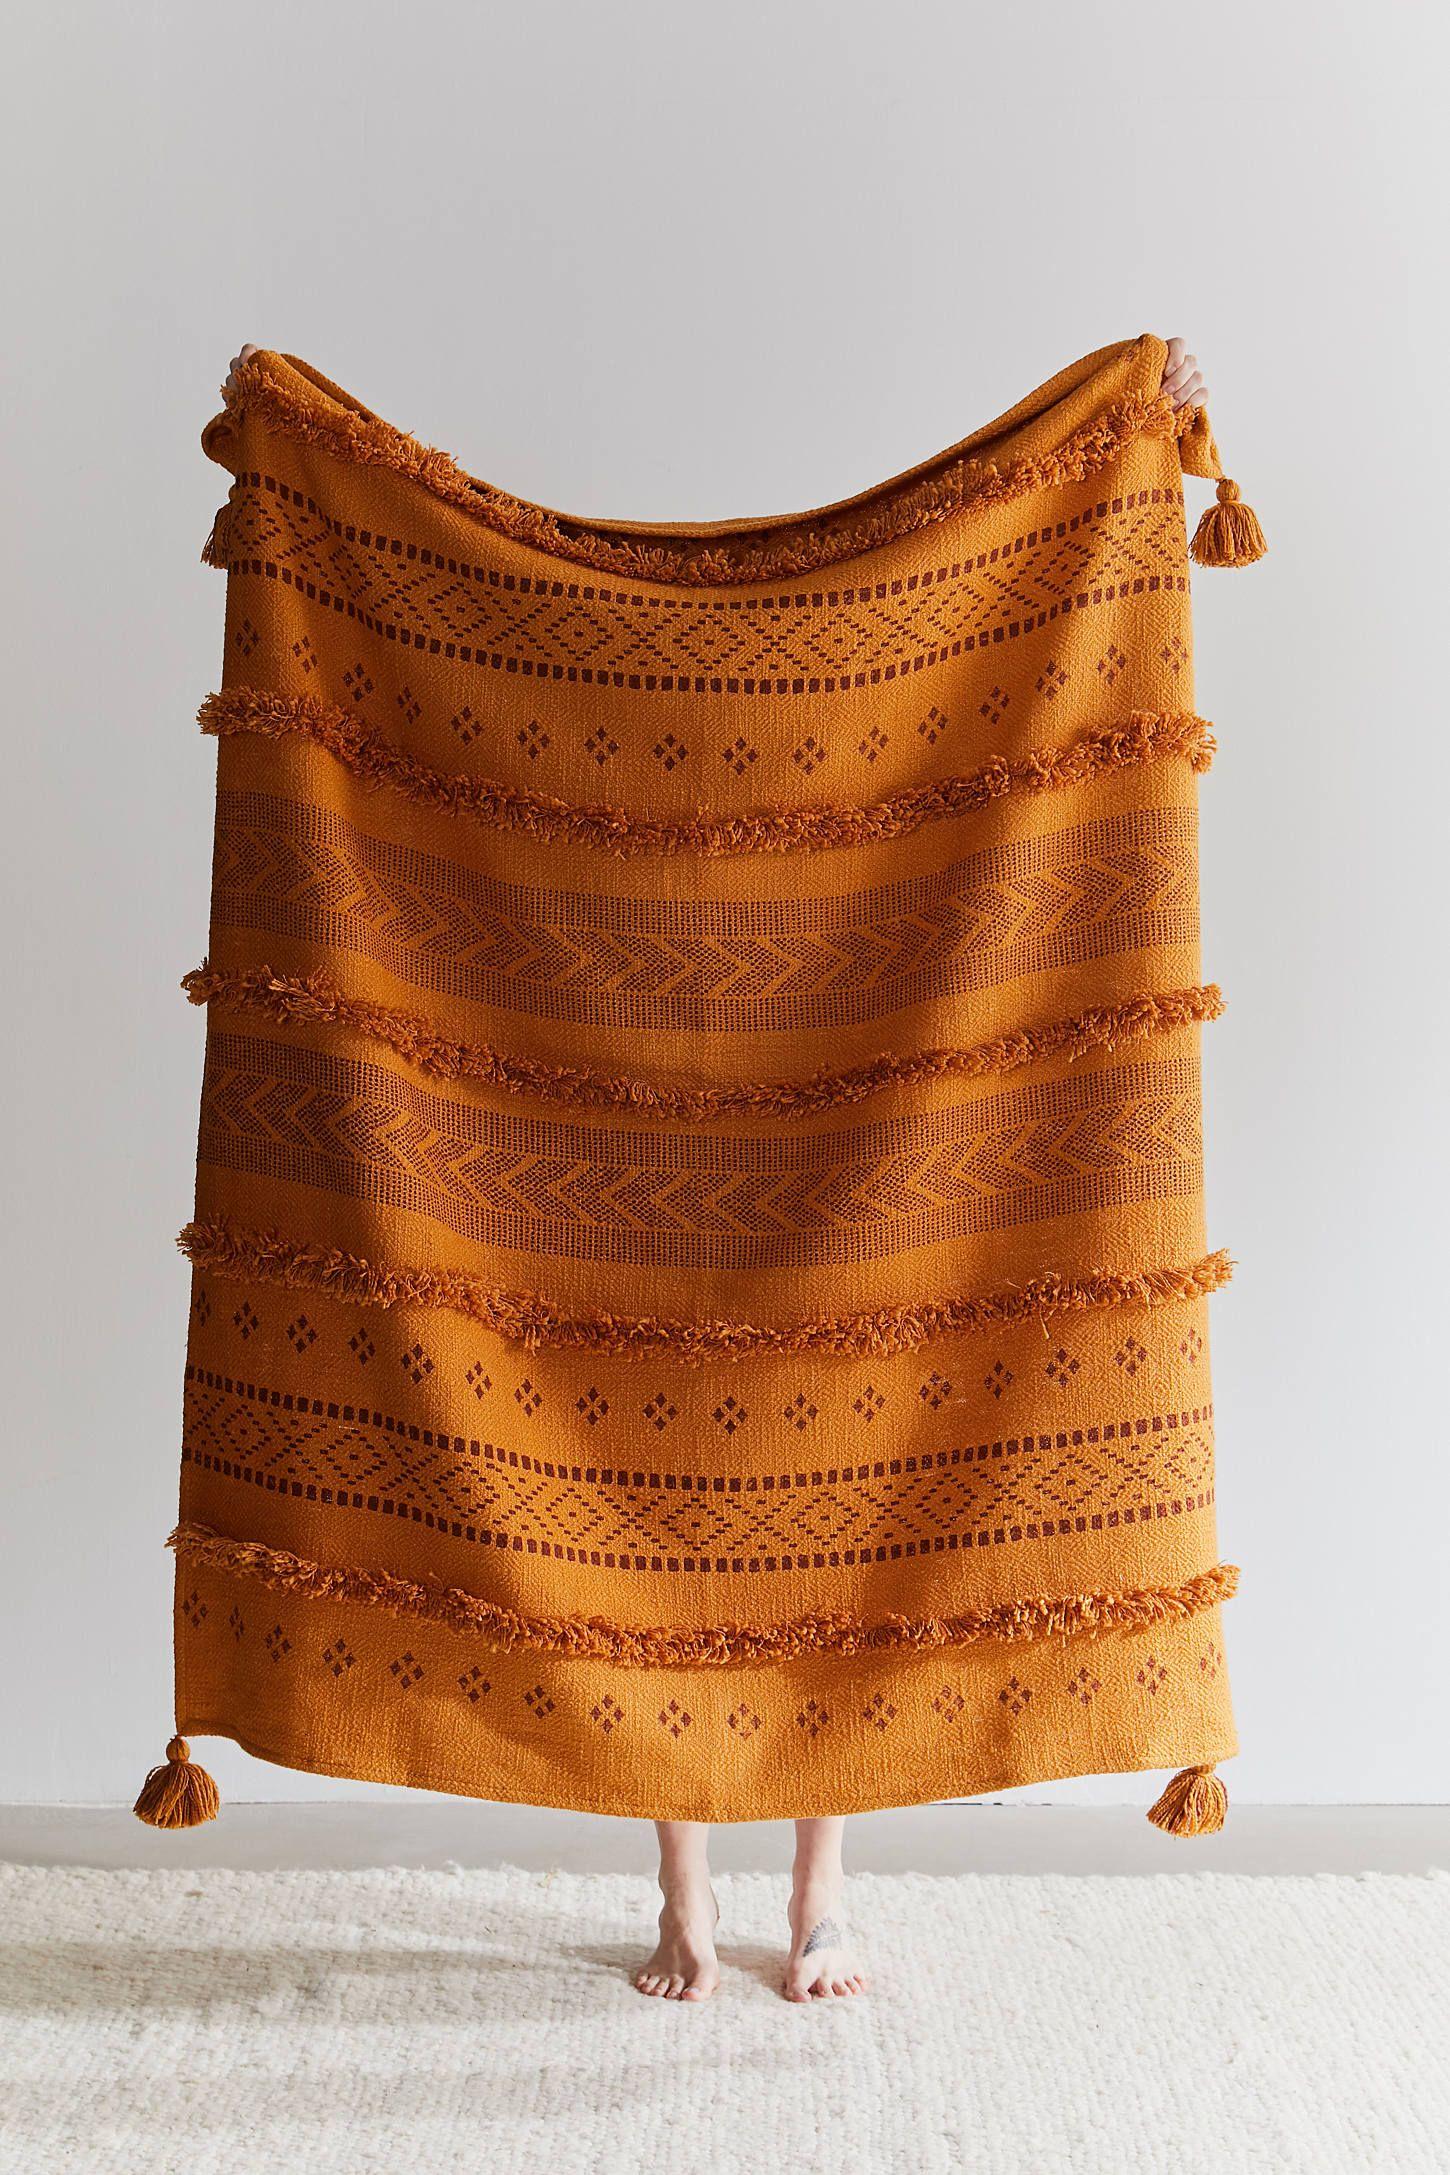 Sybil Tufted Throw Blanket Boho Throw Blanket Throw Blanket Woven Throw Blanket